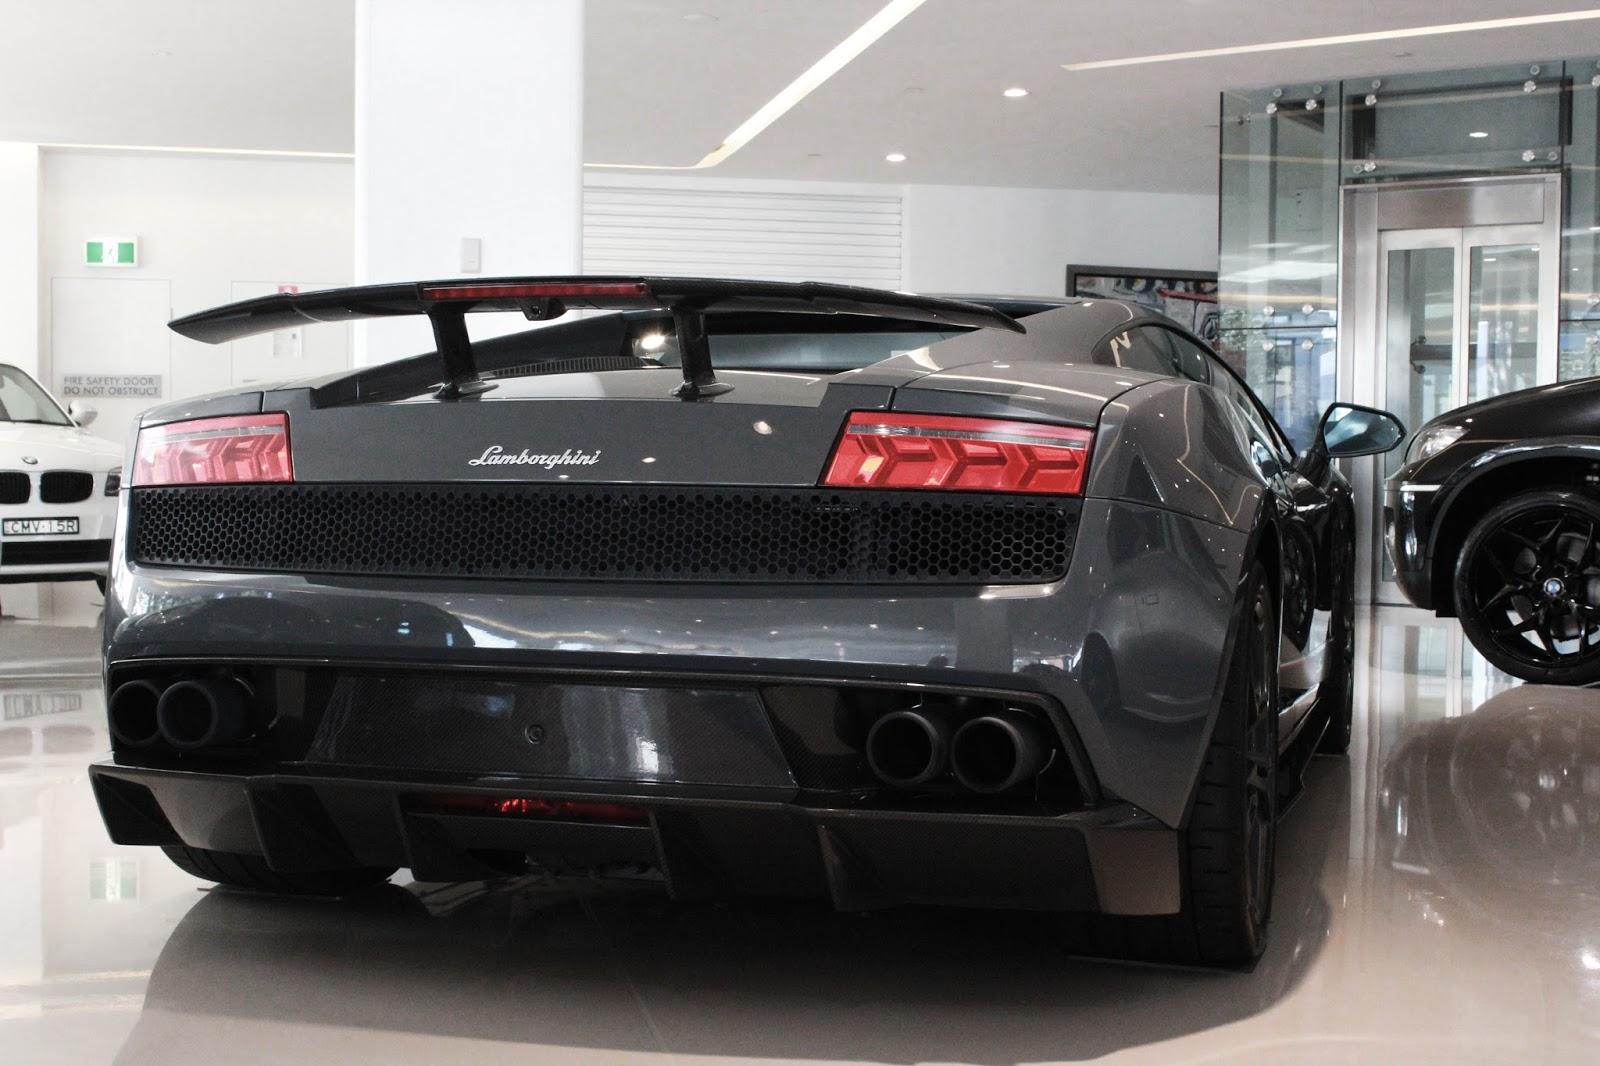 Ferrari Dealership Sydney Lamborghini Gallardo